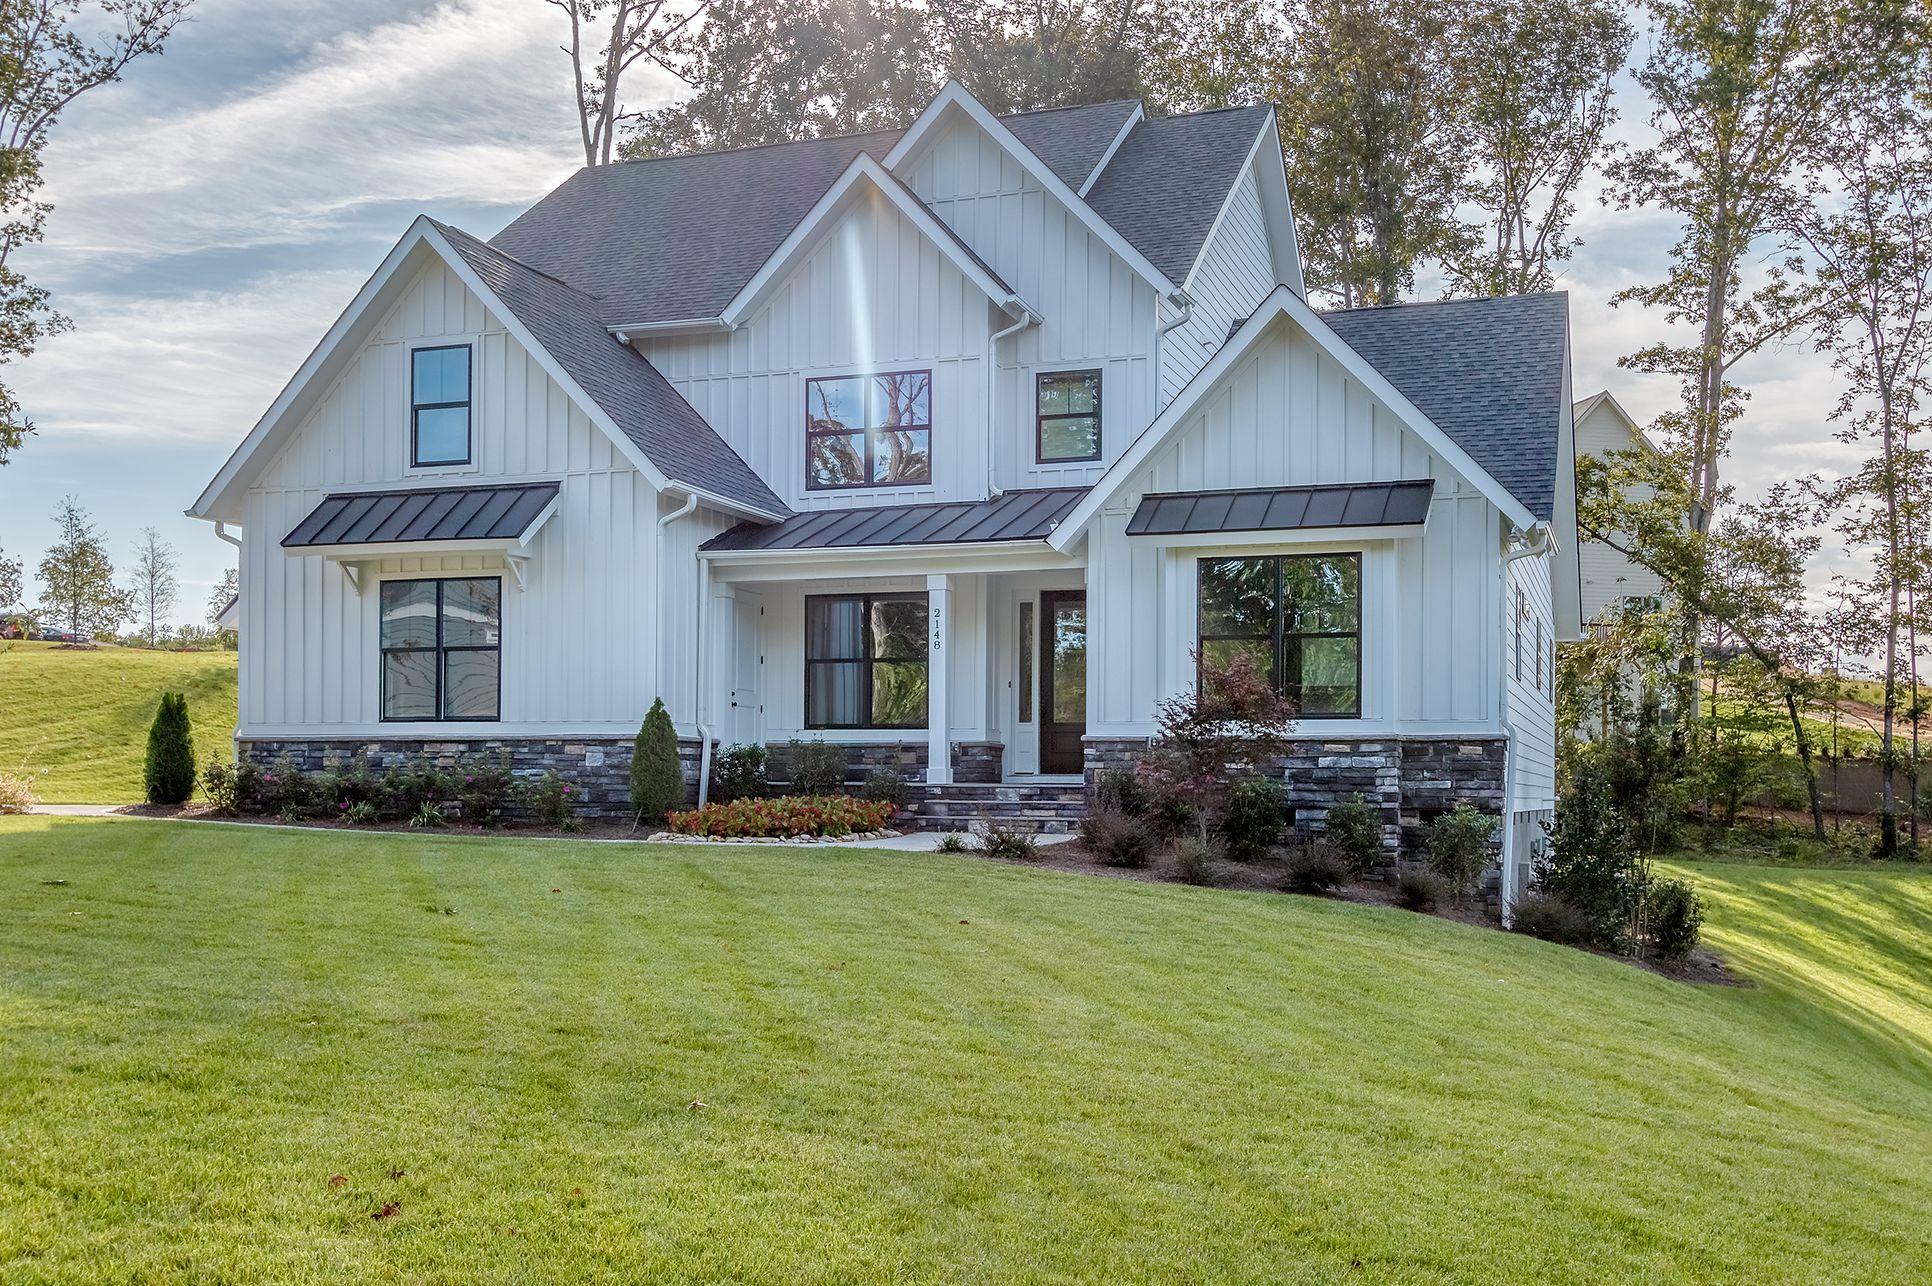 Greenville:modern farmhouse